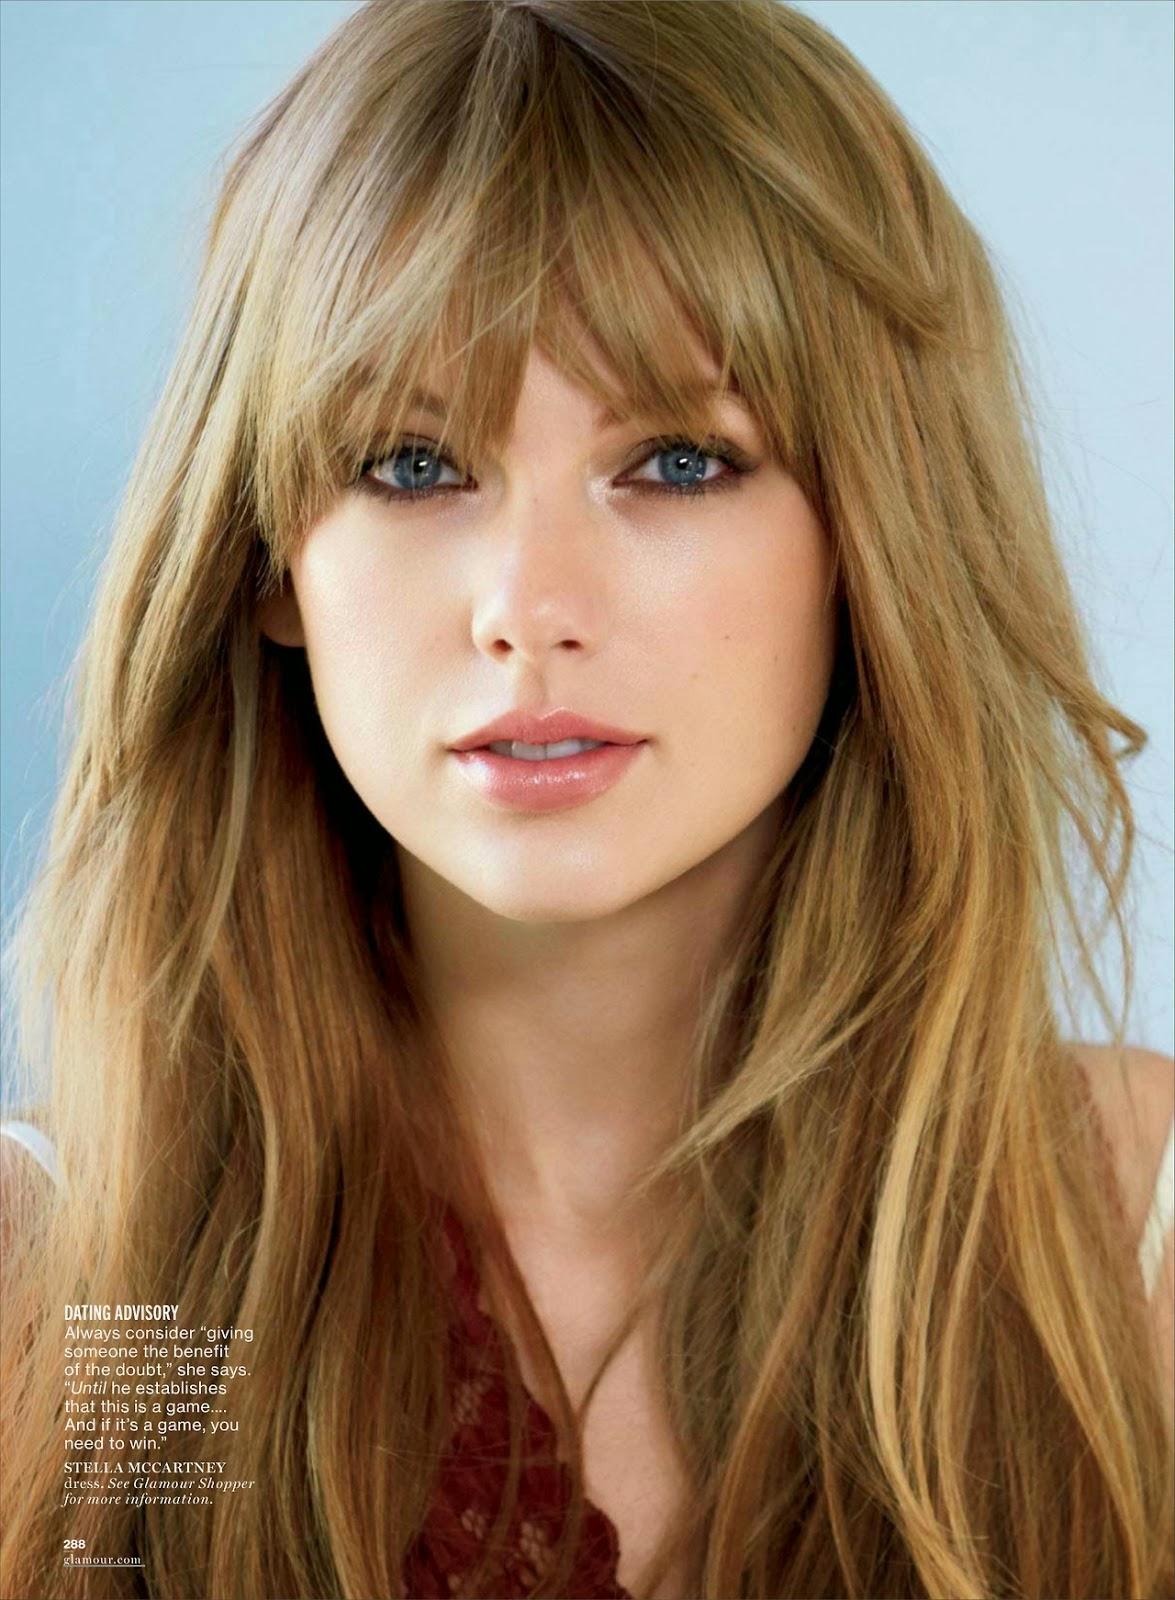 Taylor Swift 2014 Haircut